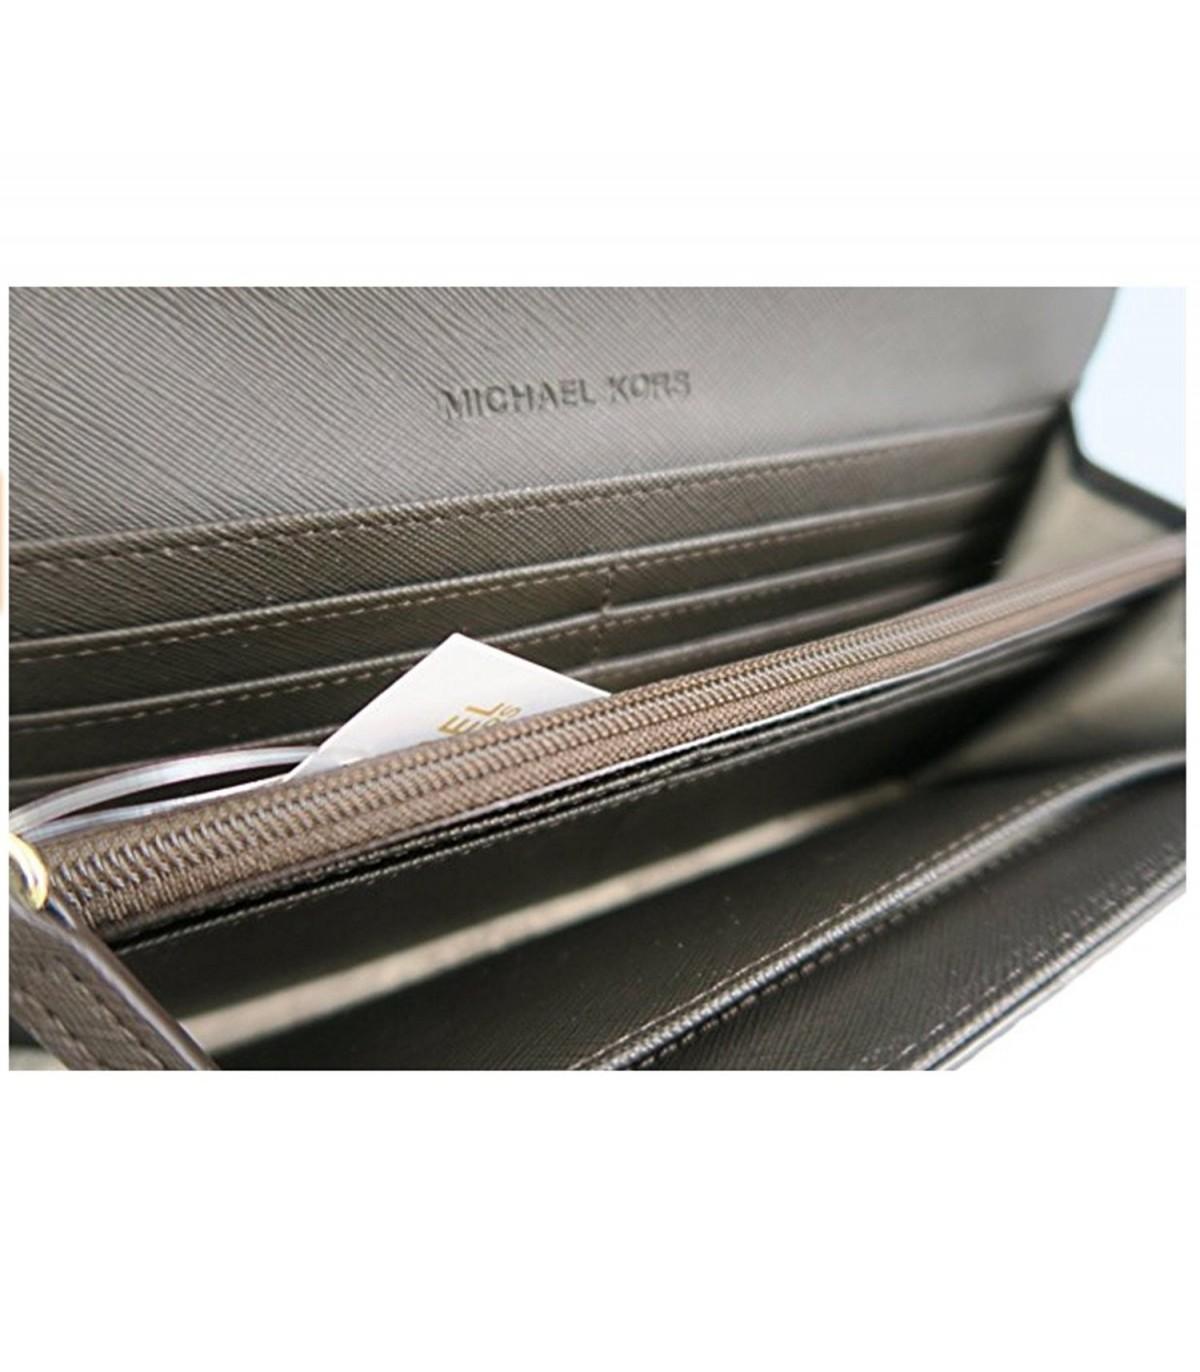 72cf6f405da72d Michael Kors Jet Set Travel PVC Signature Carryall LTR Clutch Wallet in  Brown